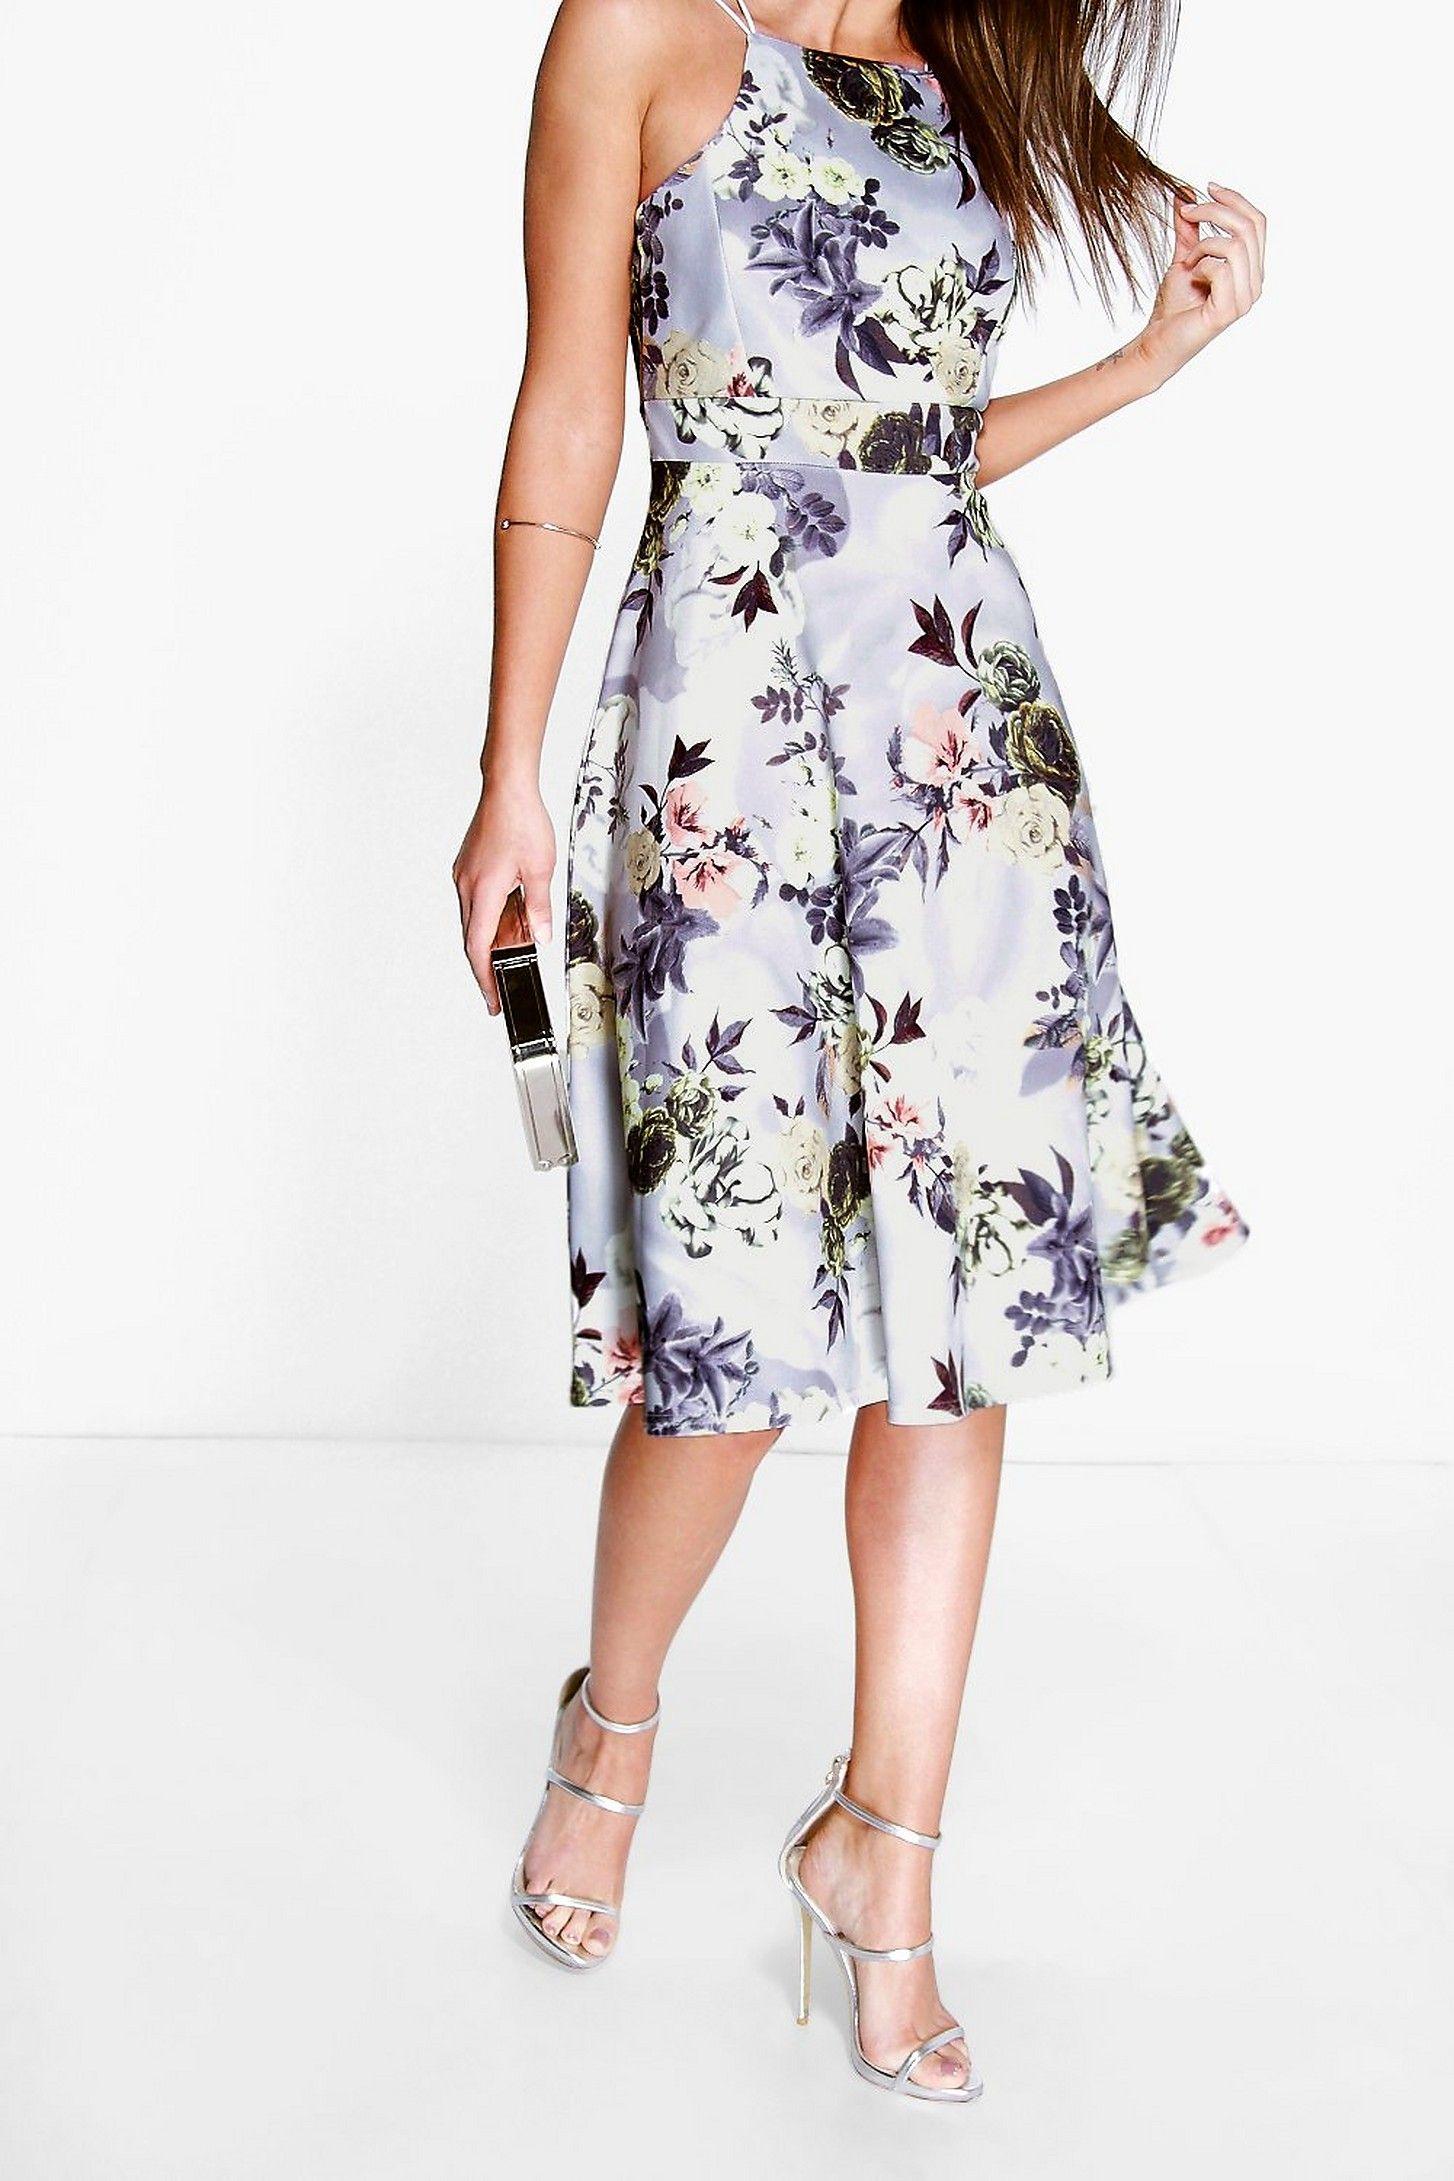 Floral Print Strappy Full Skater Dress Boohoo Dresses Macy Dresses Bodycon Fashion [ 2181 x 1454 Pixel ]